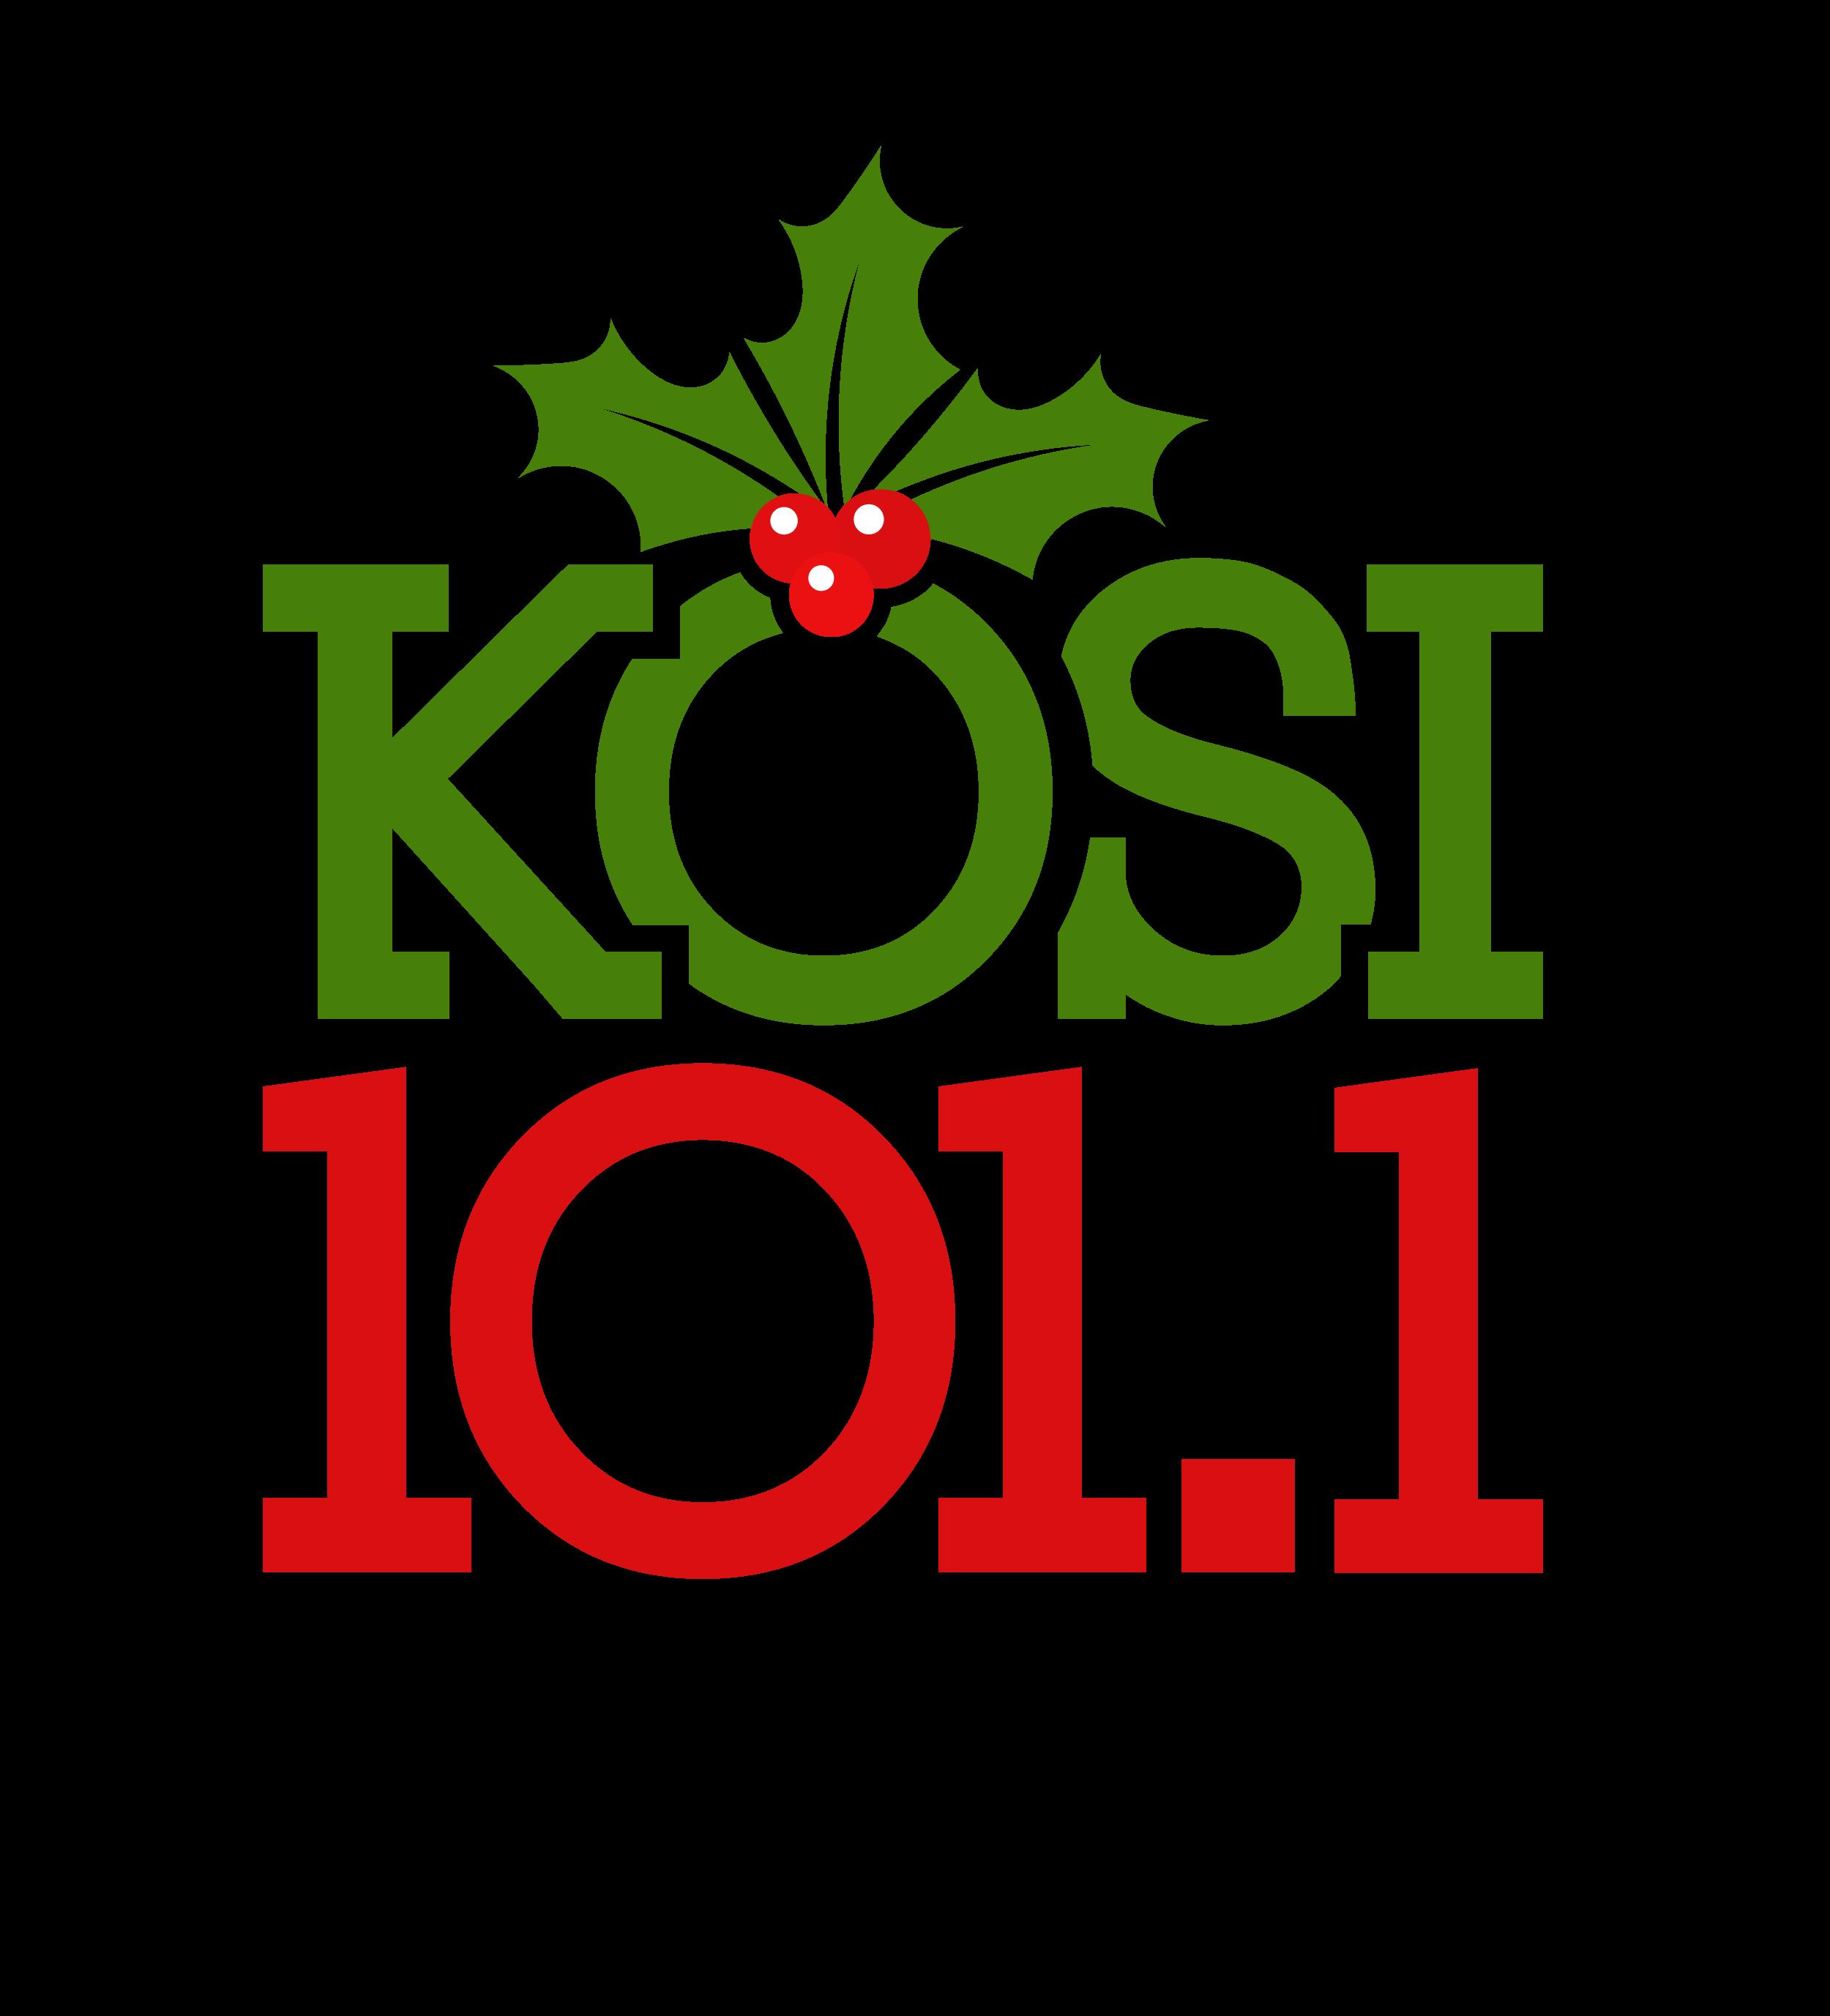 Kosi 101 Christmas Music 2020 Kosi 101 Christmas Music 2020   Cqwdxx.happynewyear 2020.site